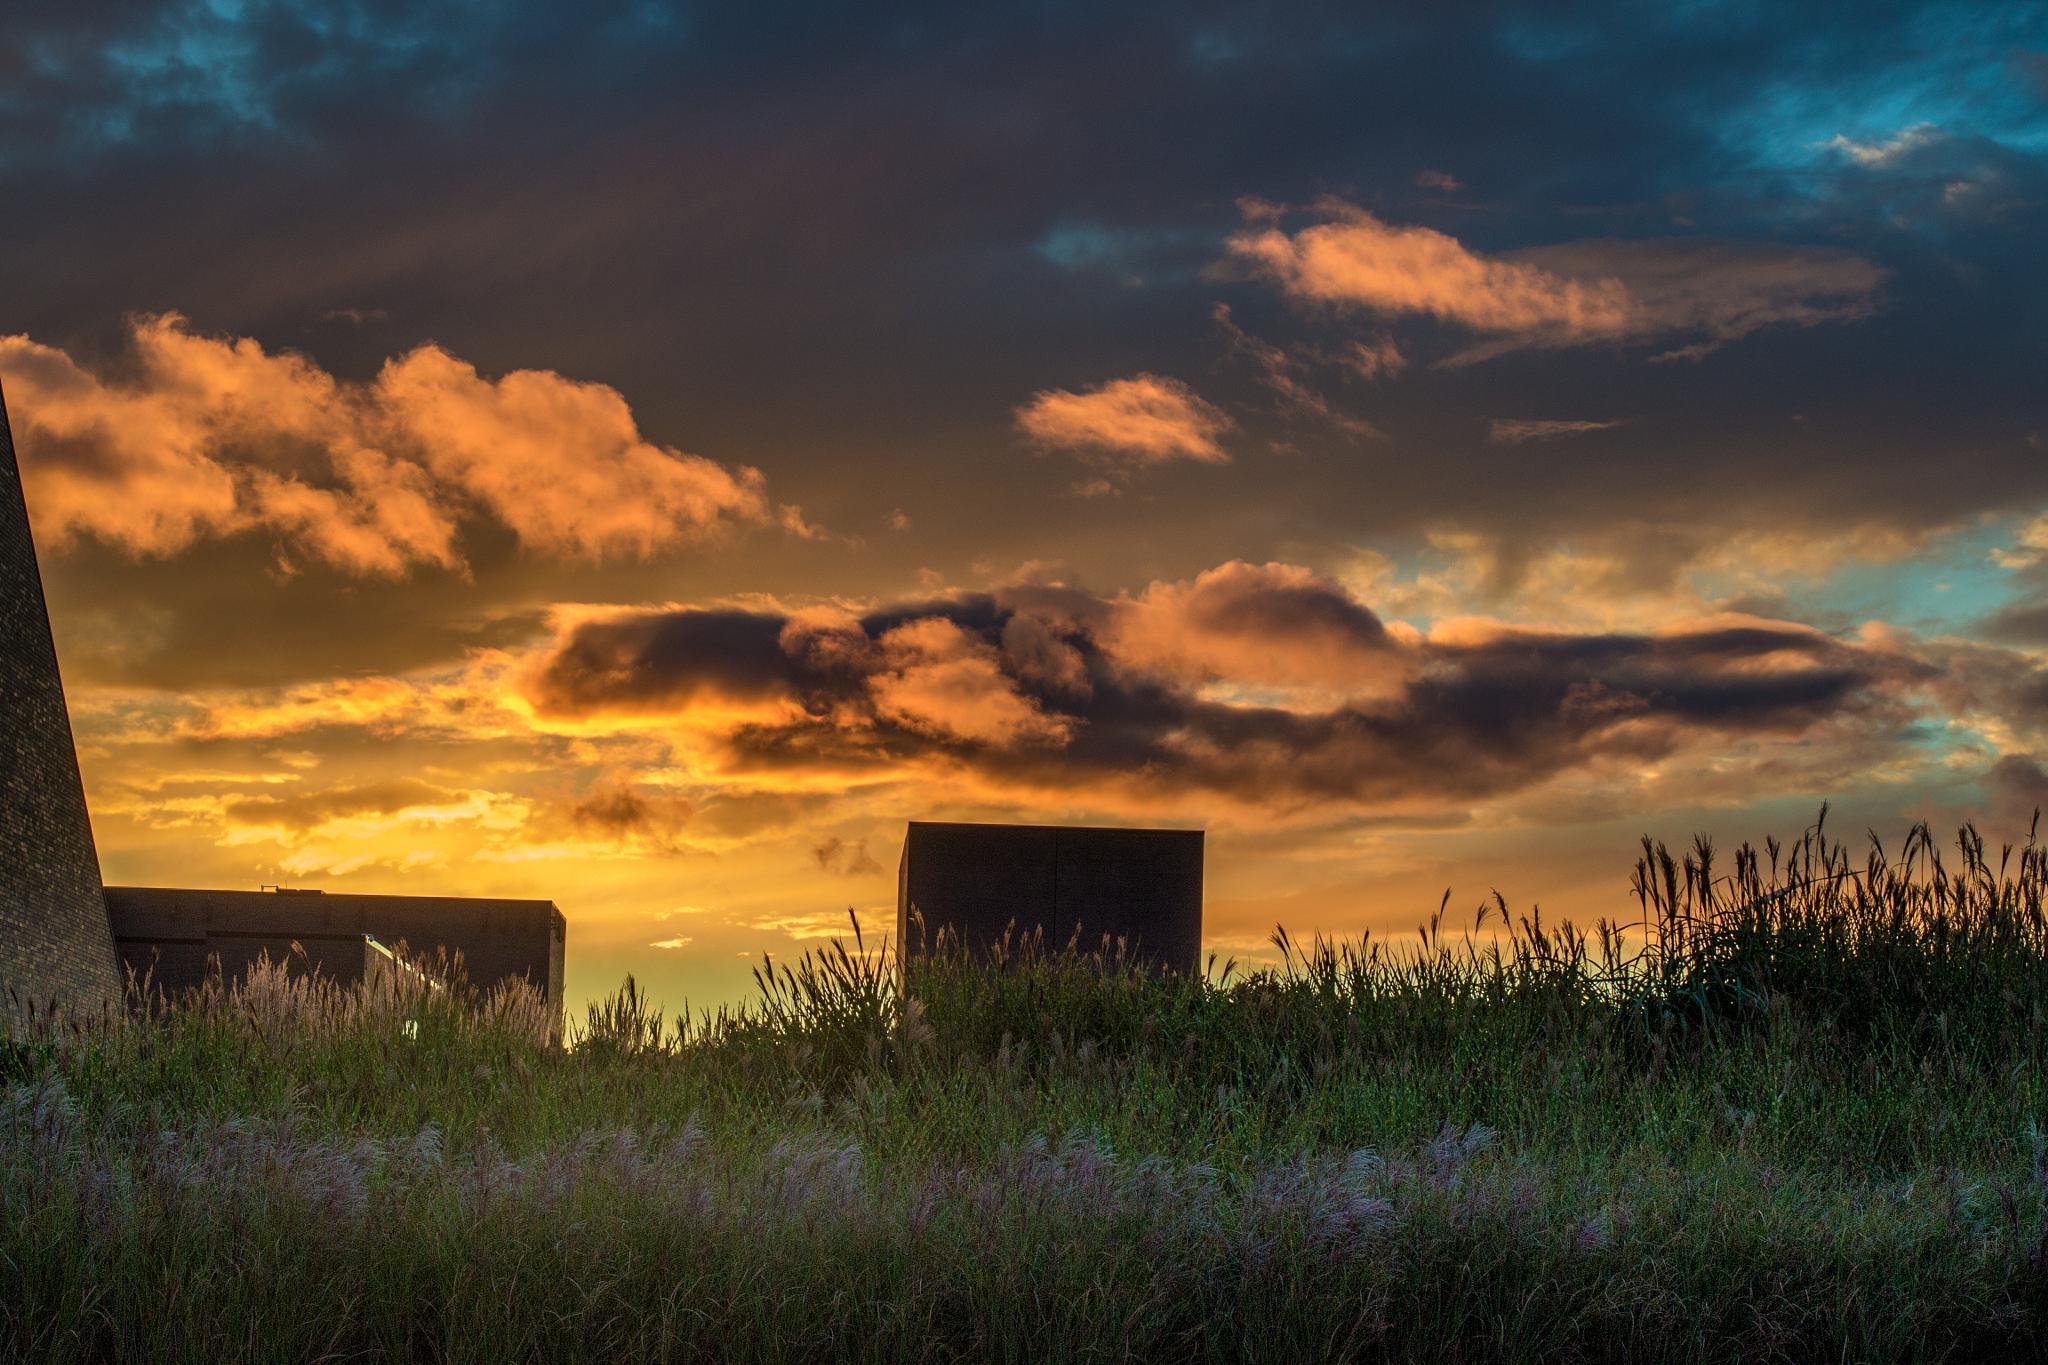 Sunset by jialian.lin